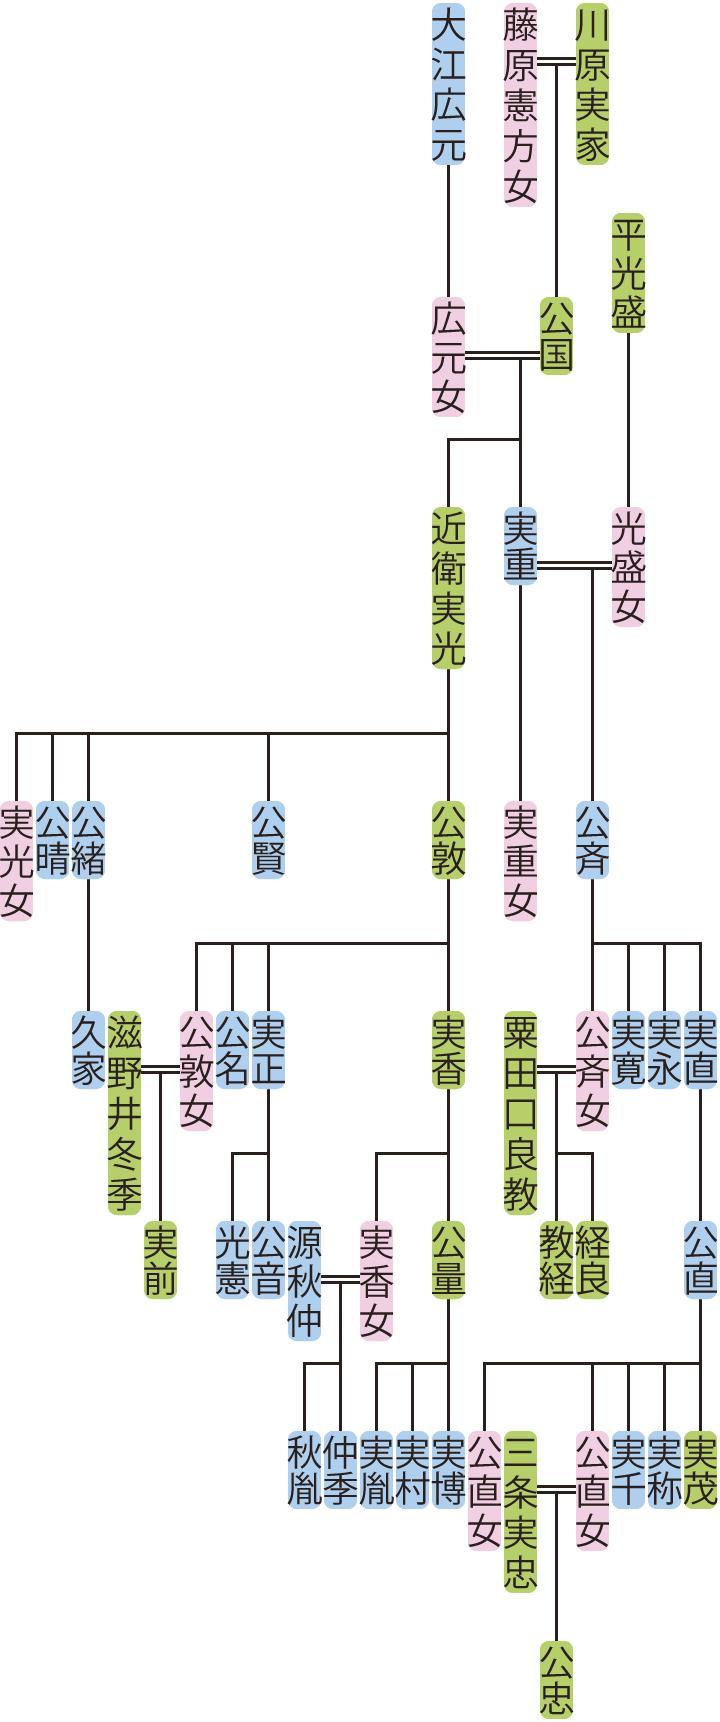 川原実重・近衛実光の系図